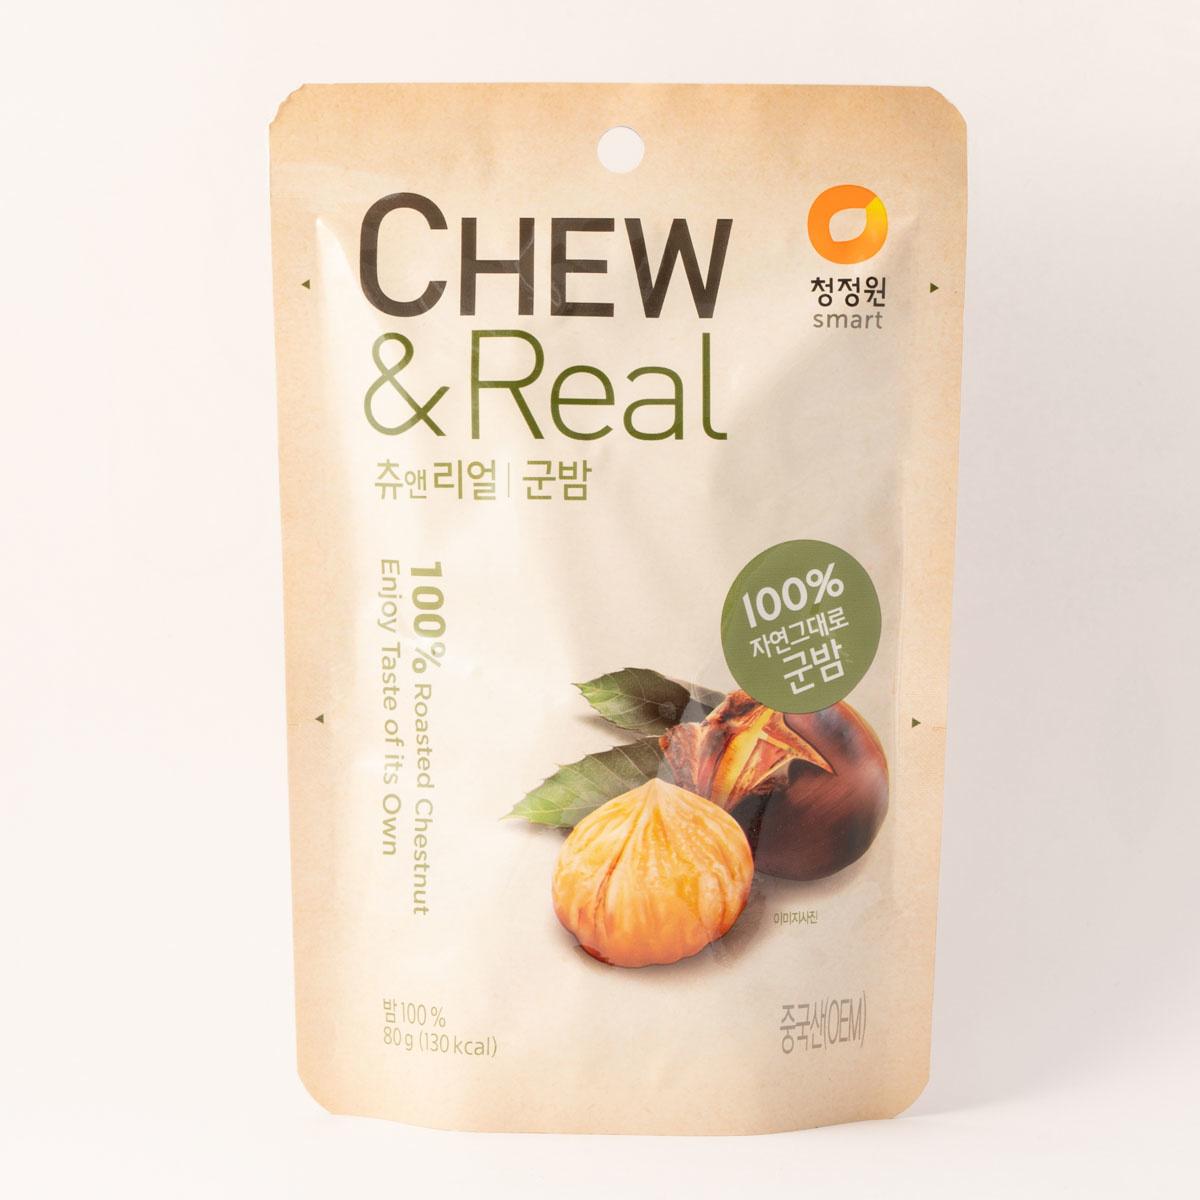 Chew & Crispy Chestnut